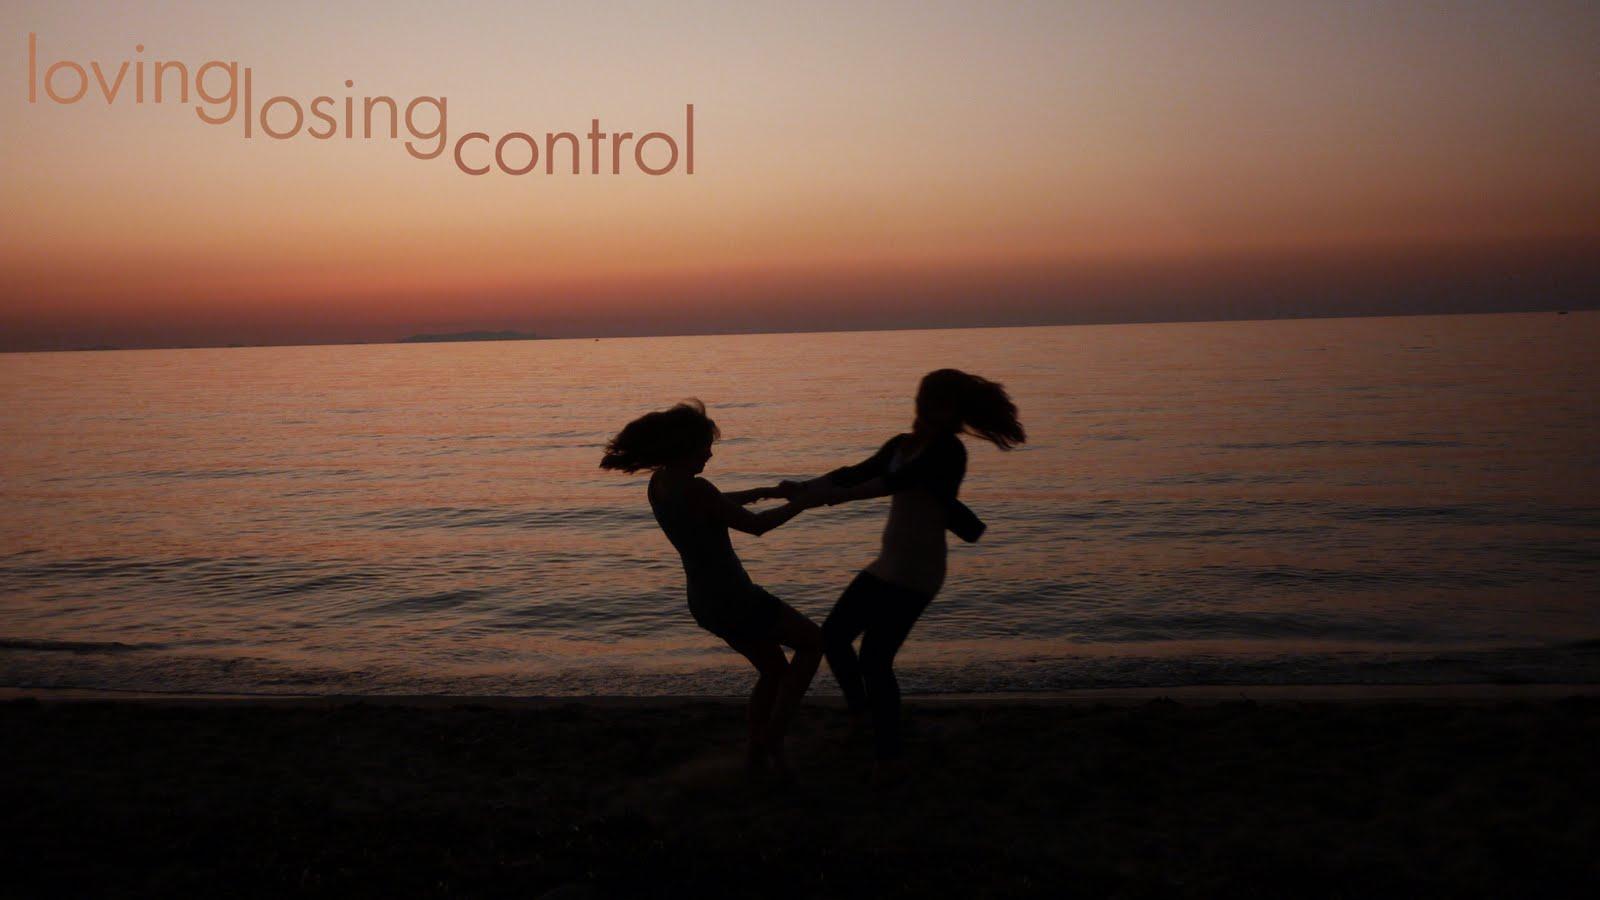 loving losing control